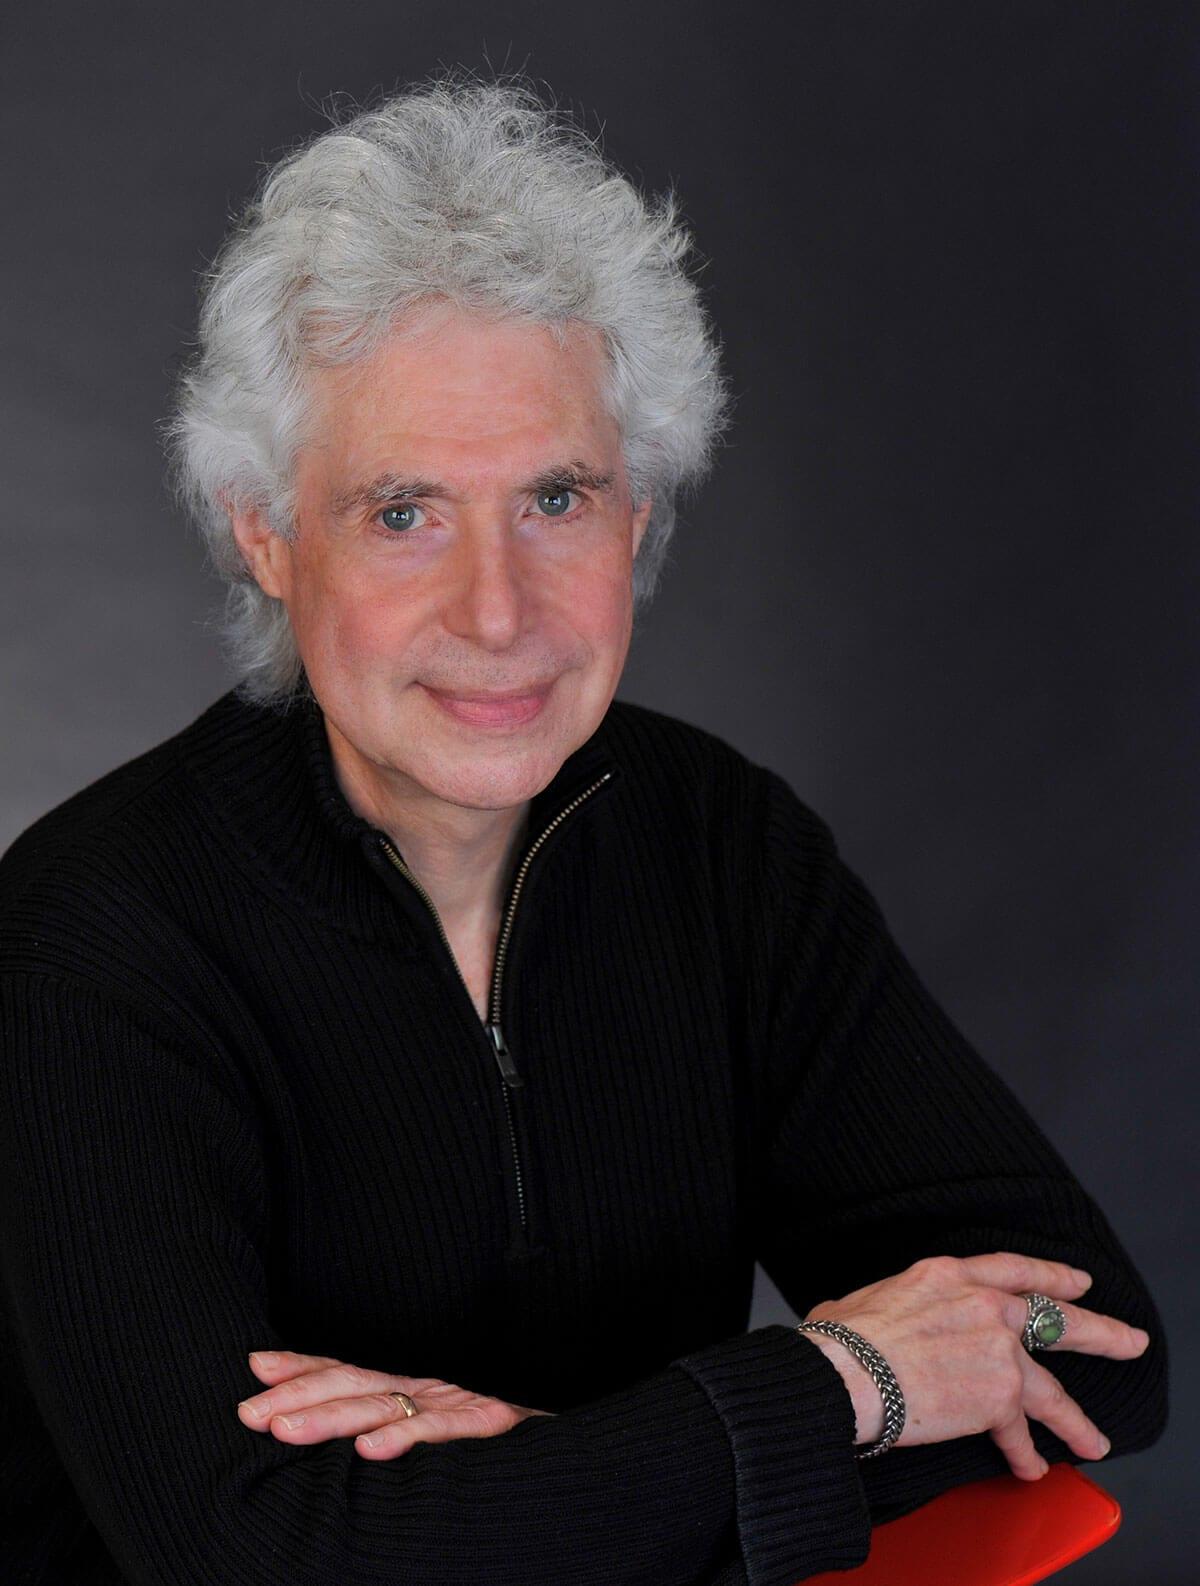 Robert Steven Goldstein